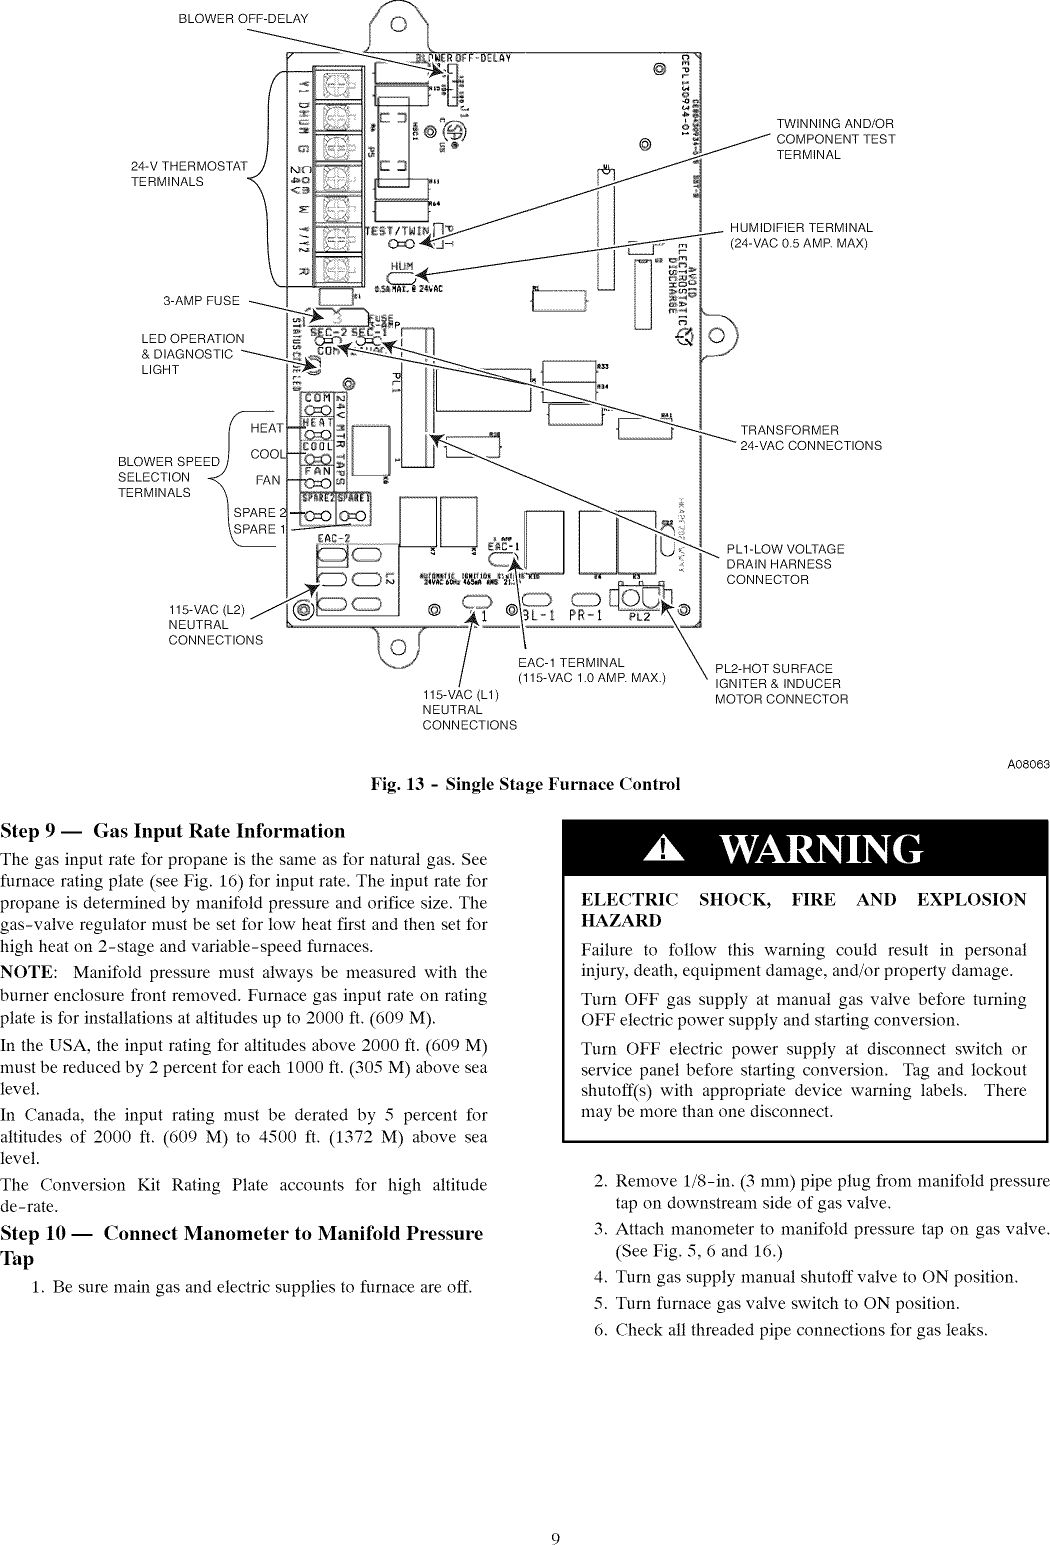 CARRIER Furnace/Heater, Gas Manual L1002541